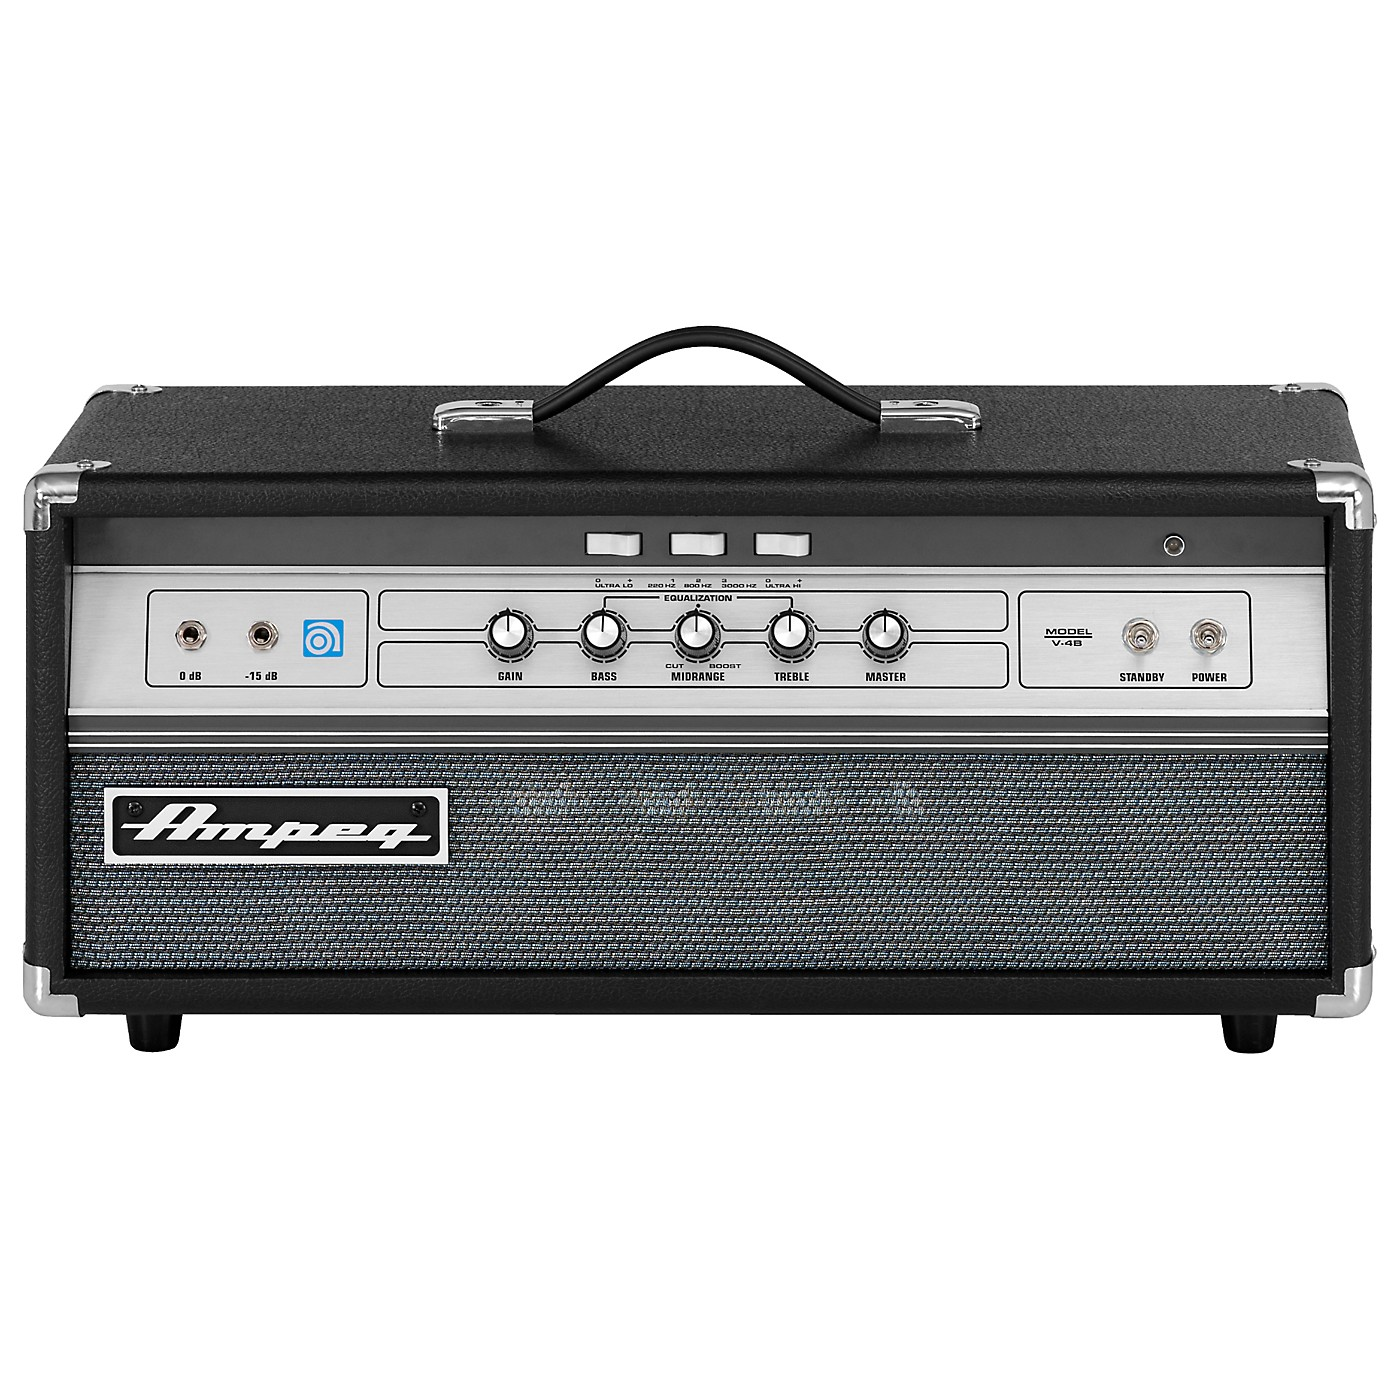 Ampeg V-4B All-Tube 100W  Classic Bass Amp Head thumbnail